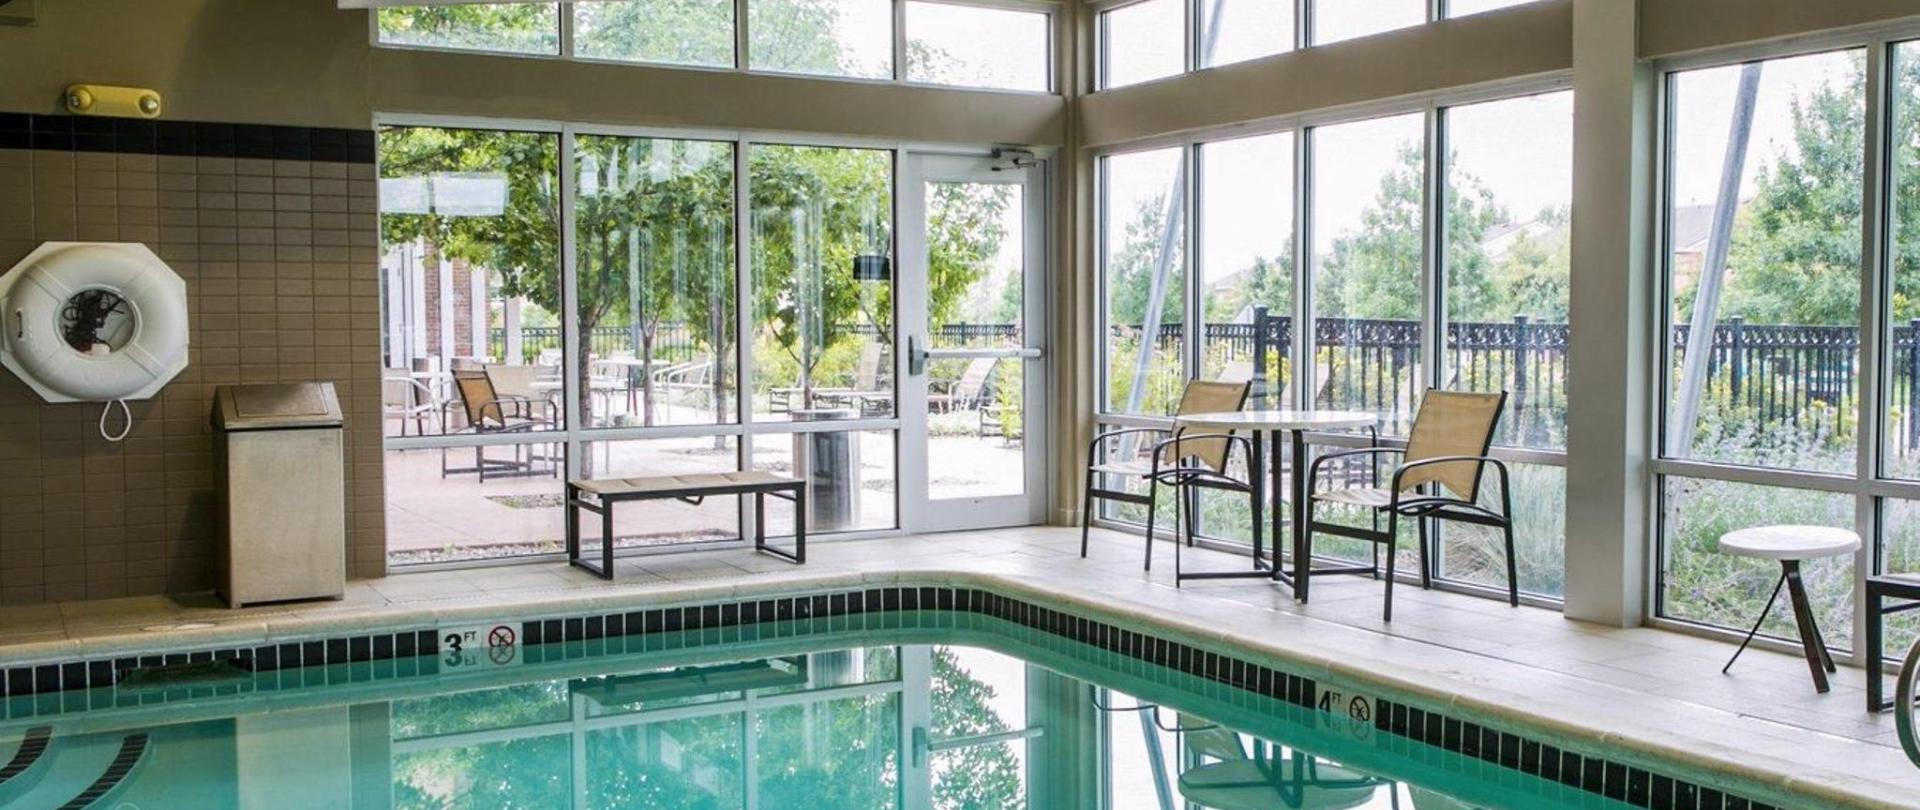 poolcourtyard2.JPG